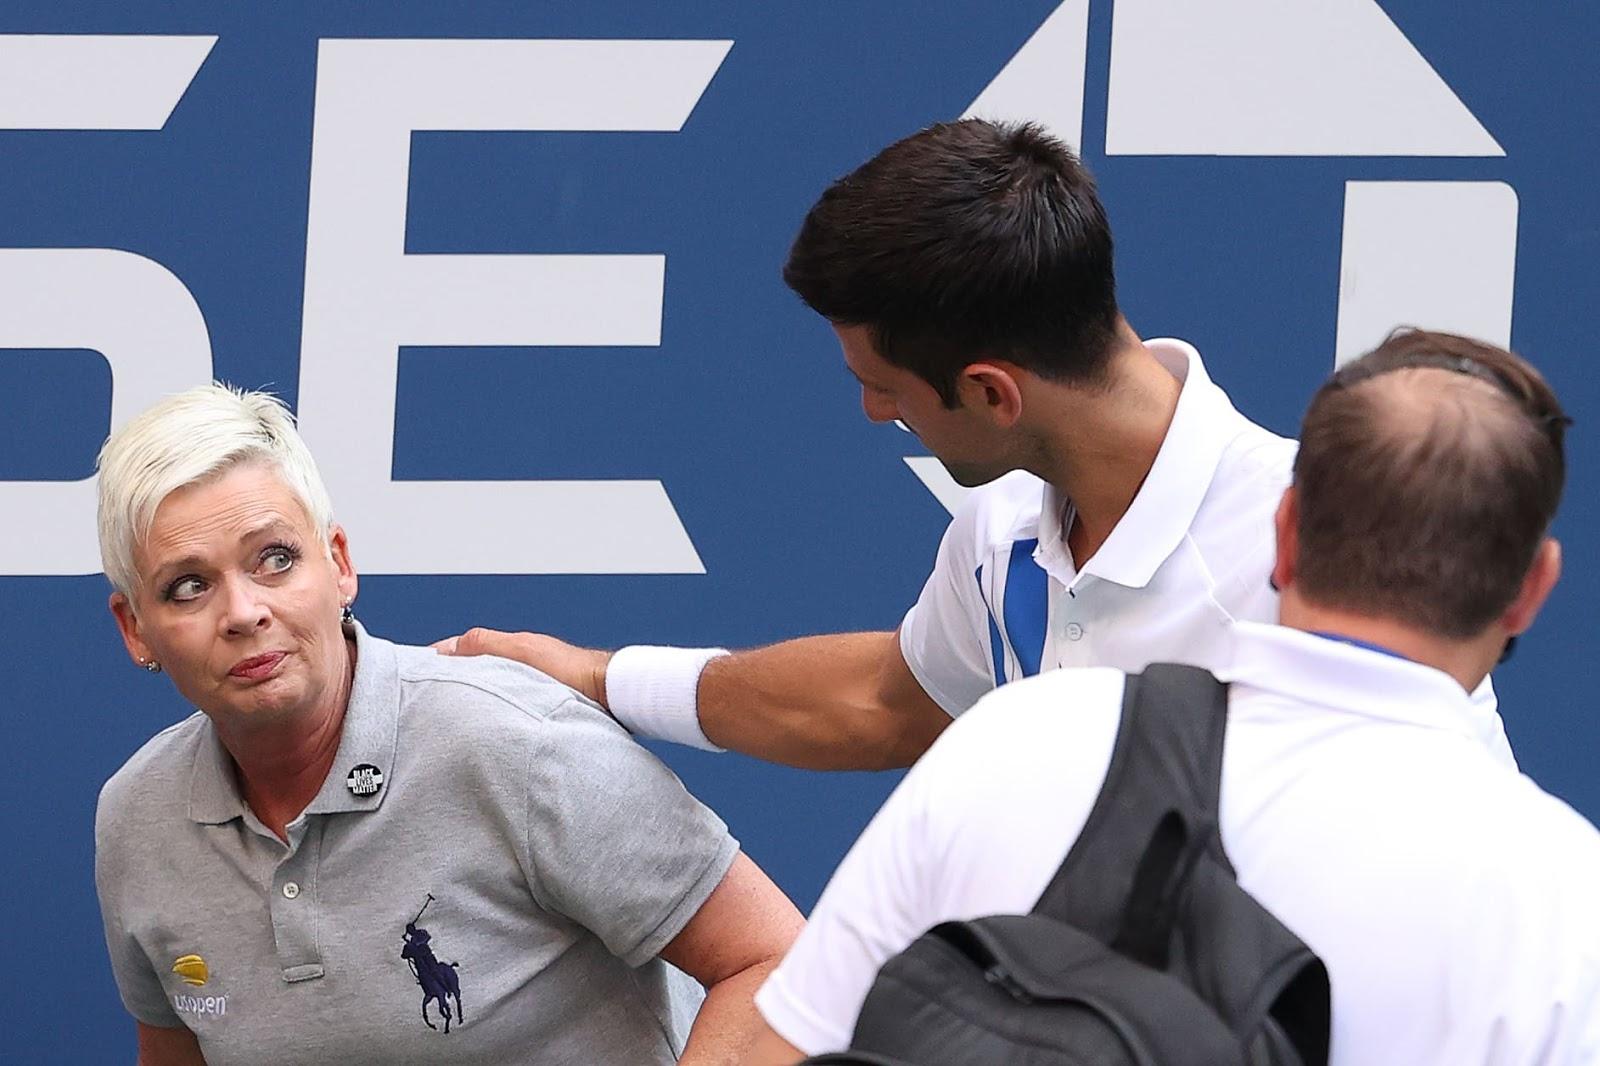 Djokovic descalificado